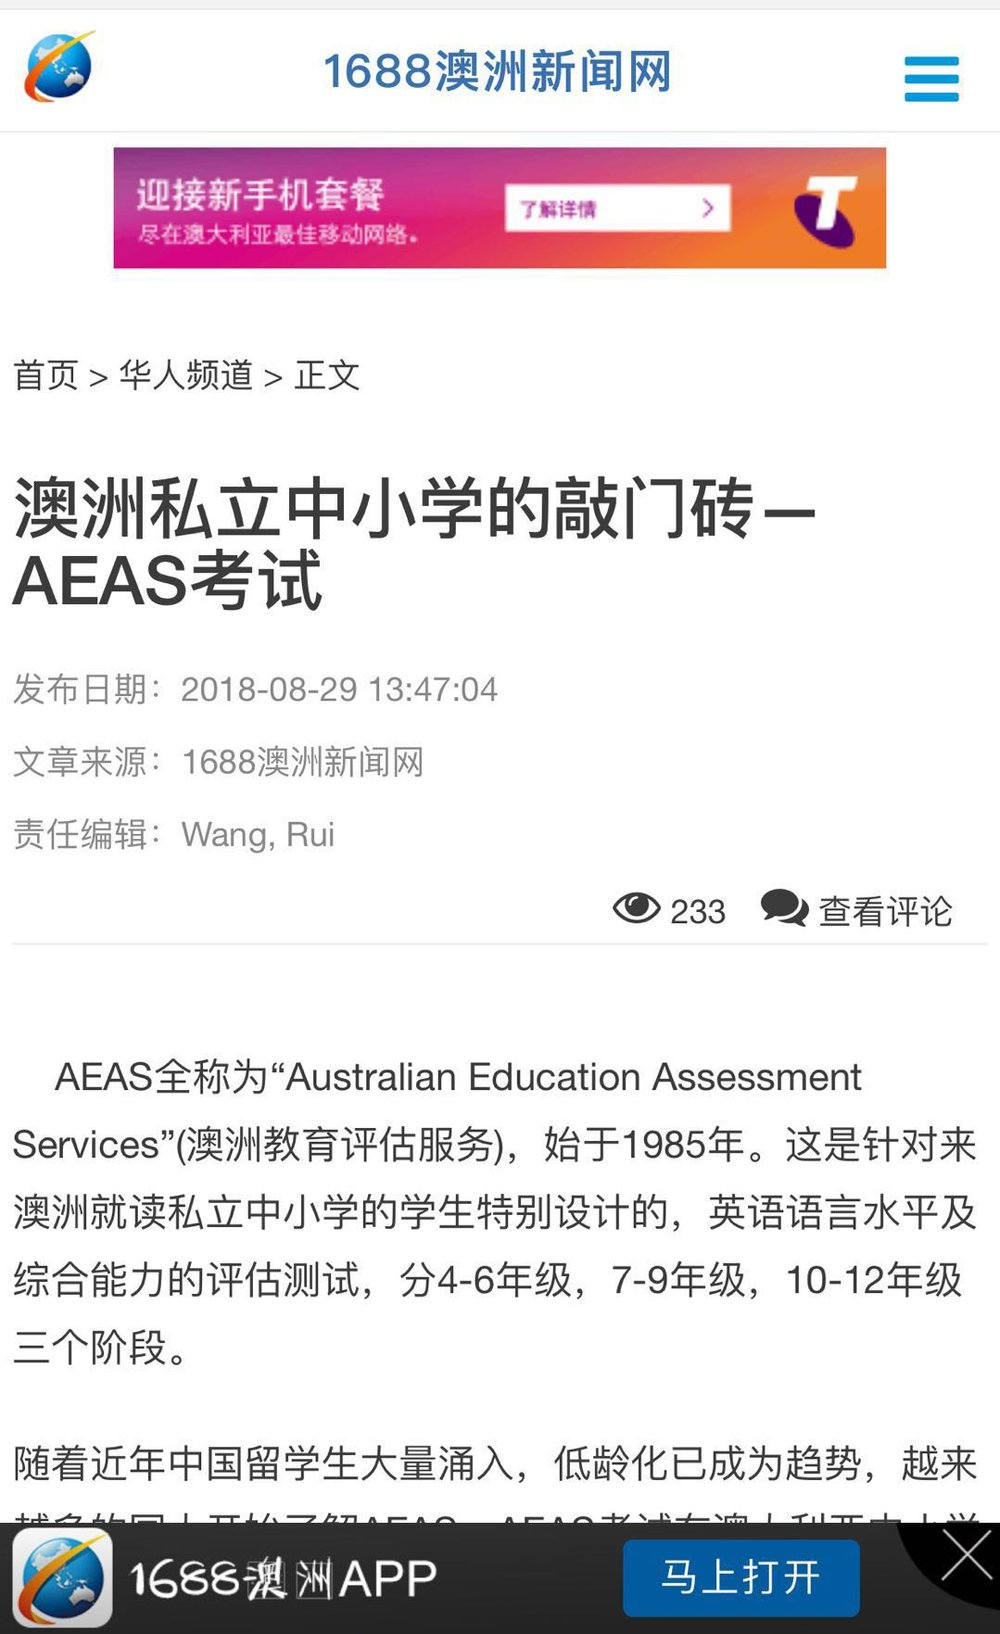 1688 Australian News  - JPI Education, 悉尼AEAS备考集训 (AEAS Preparation Course, Sydney) 29th August 2018, Website.